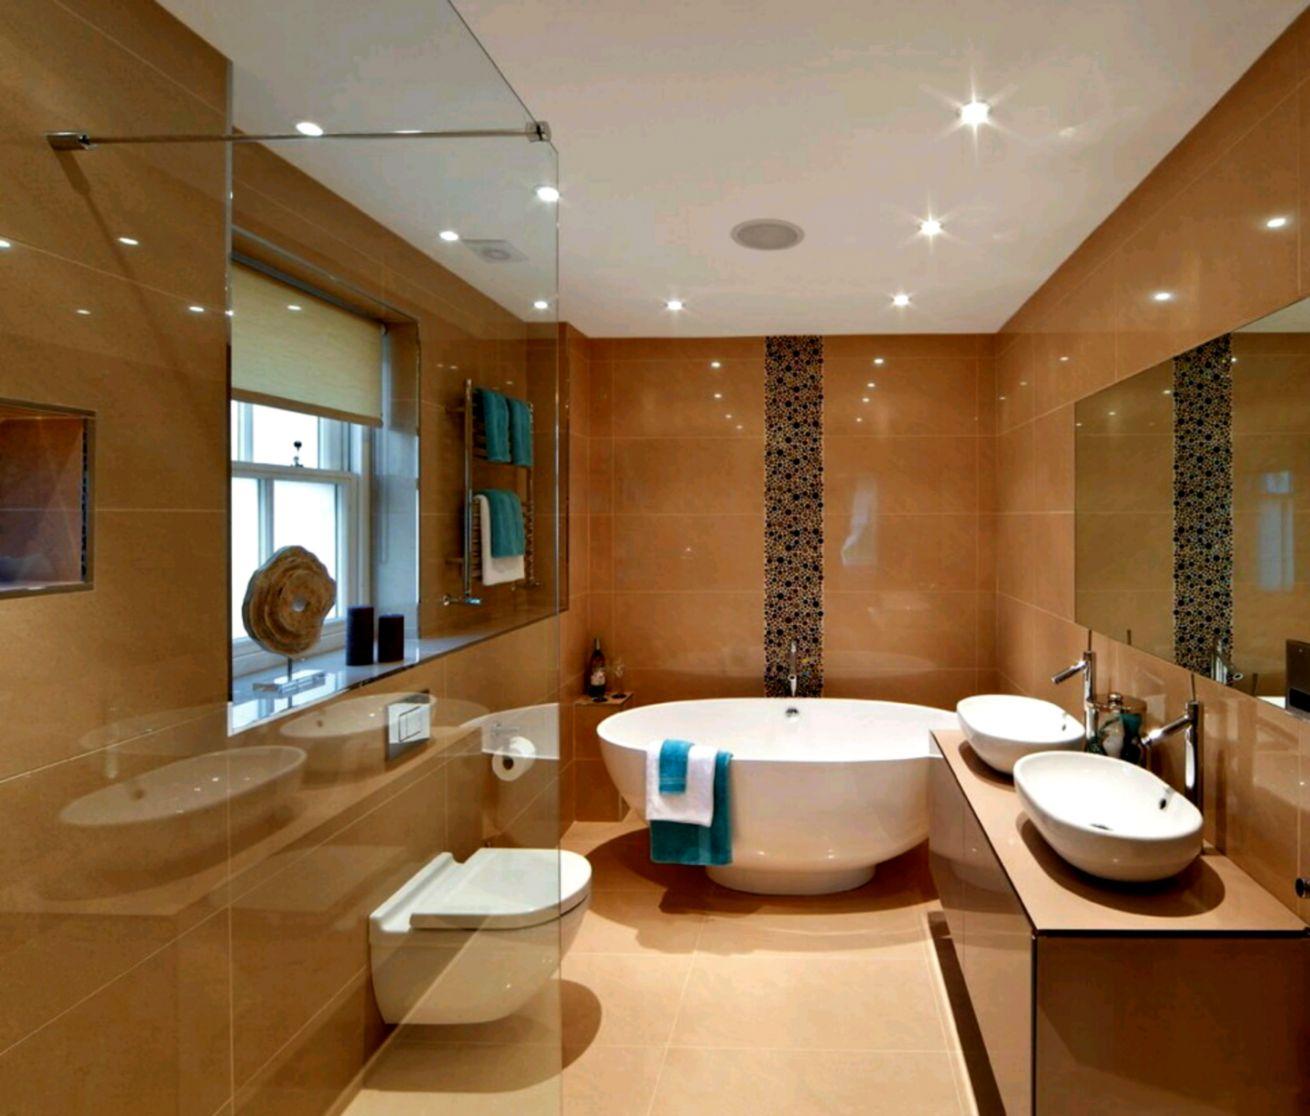 Interior Design Ideas Bathrooms Tumblr Image Wallpapers Hd